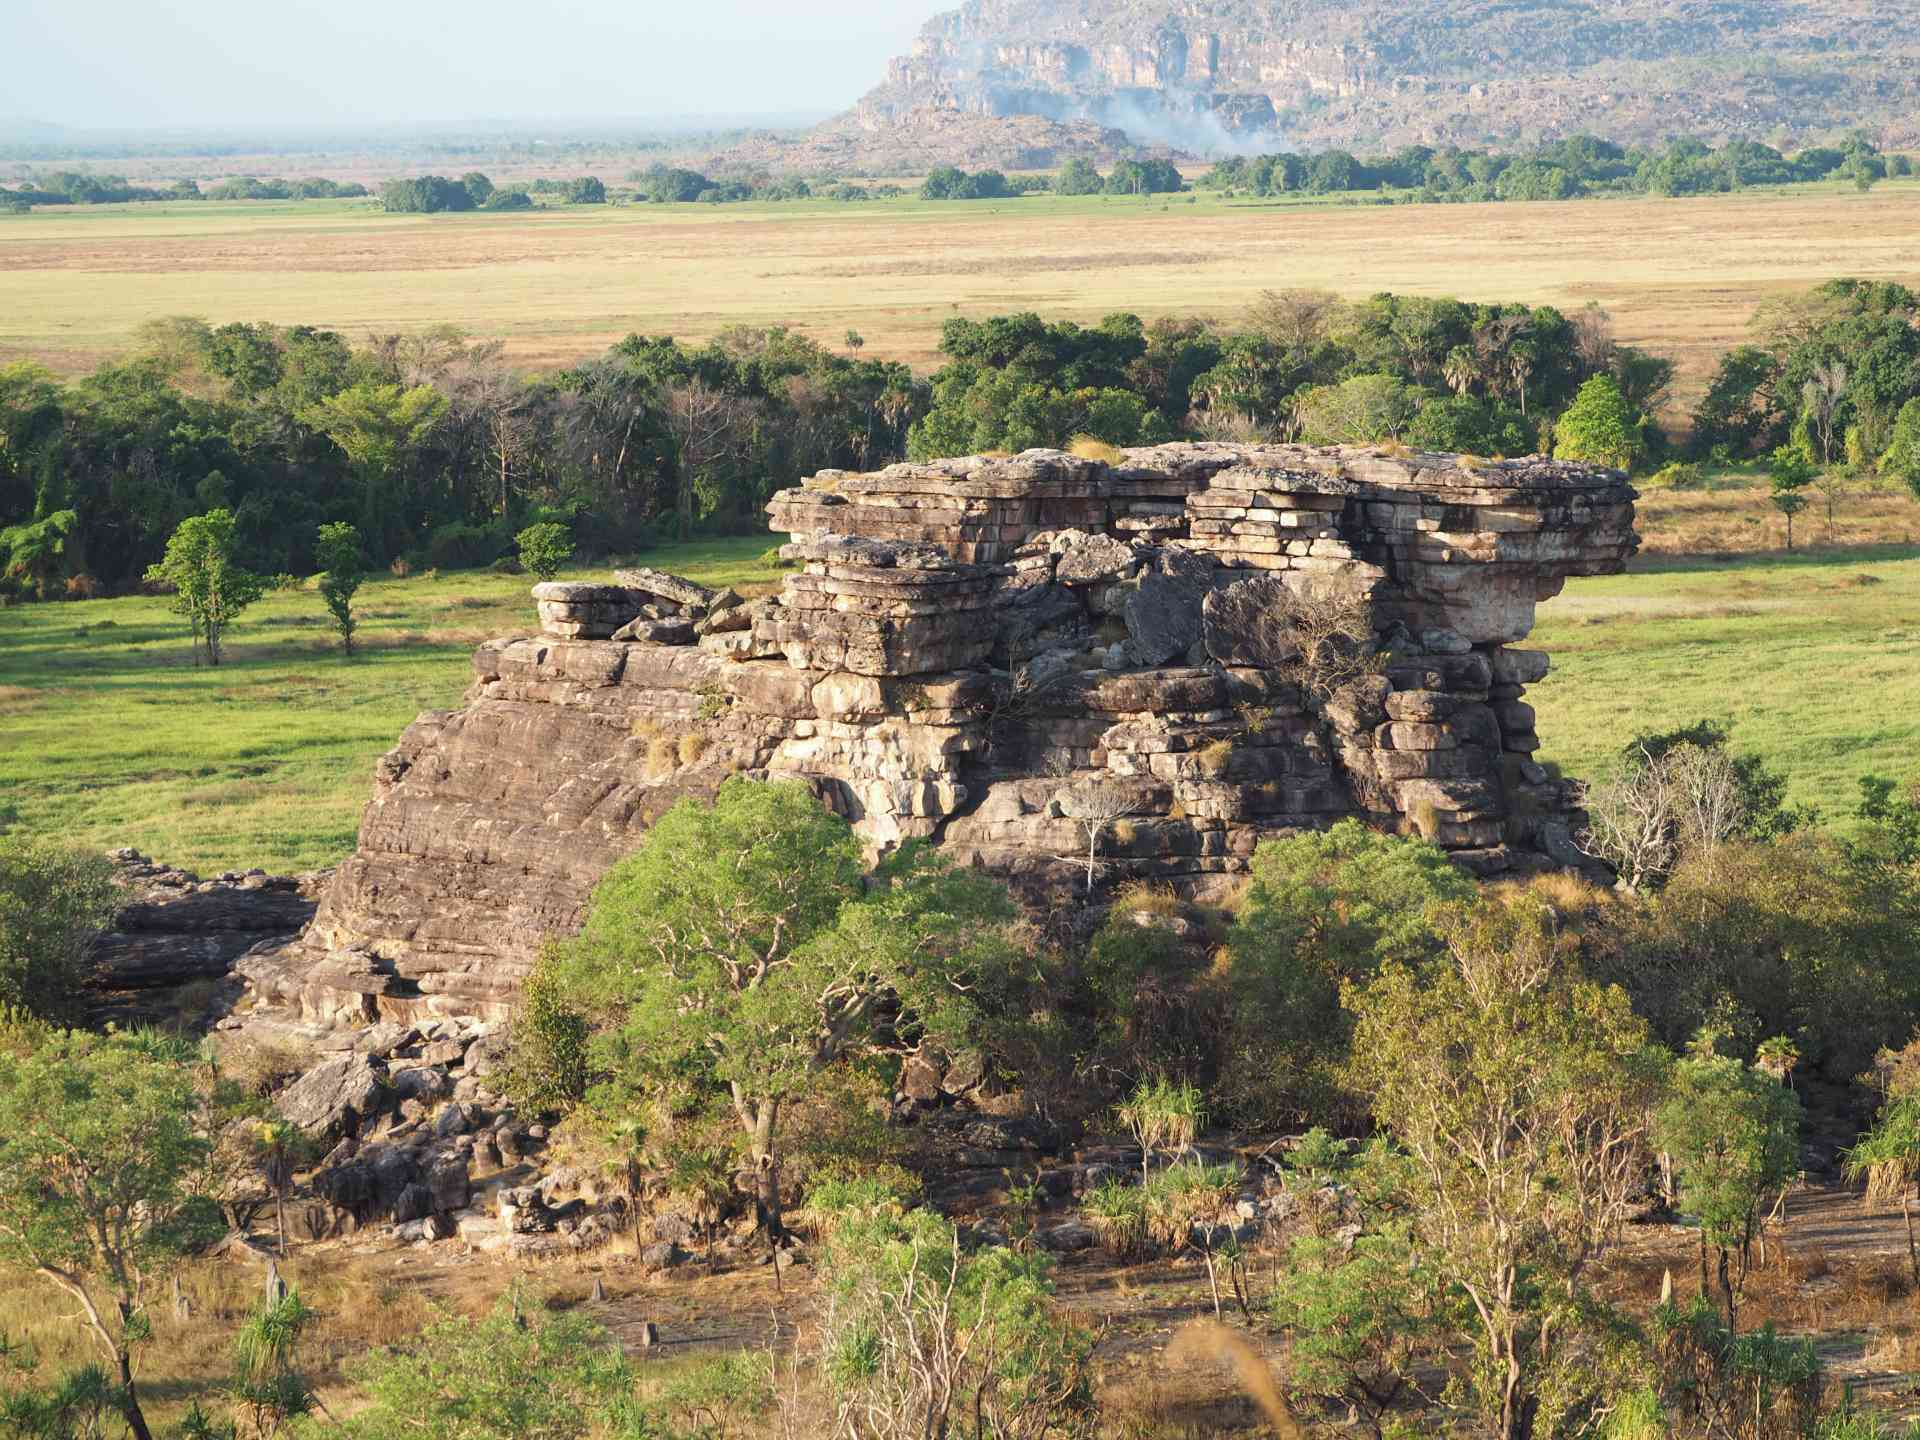 Views on the Ubirr walk, Kakadu, Northern Territory by Annelieke Huijgens